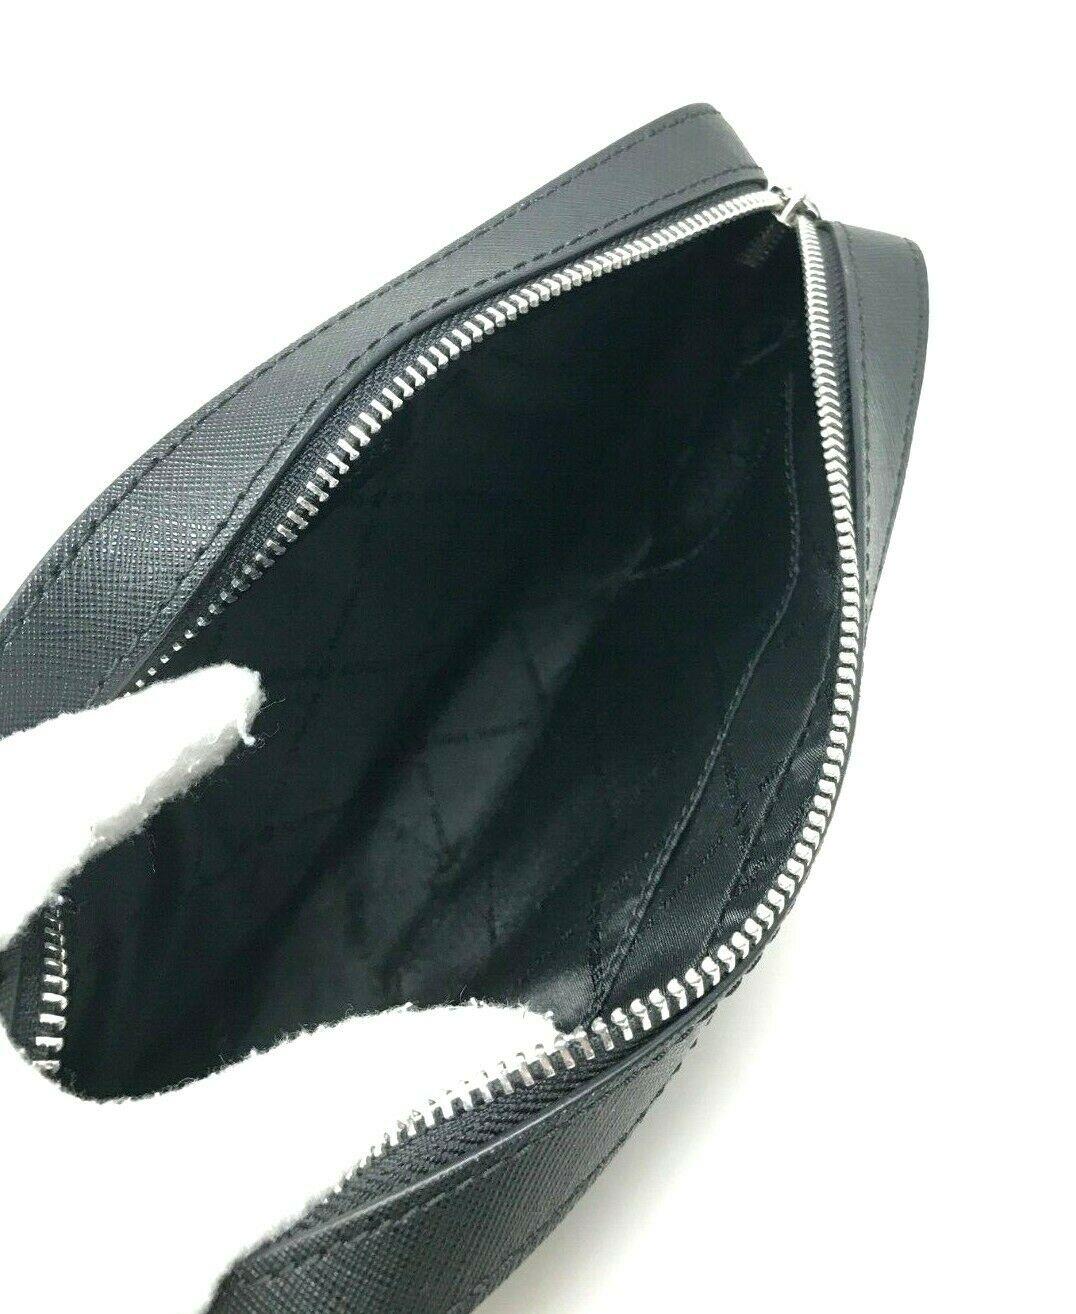 thumbnail 85 - Michael Kors Jet Set Item Large East West Crossbody Chain Handbag Clutch $298